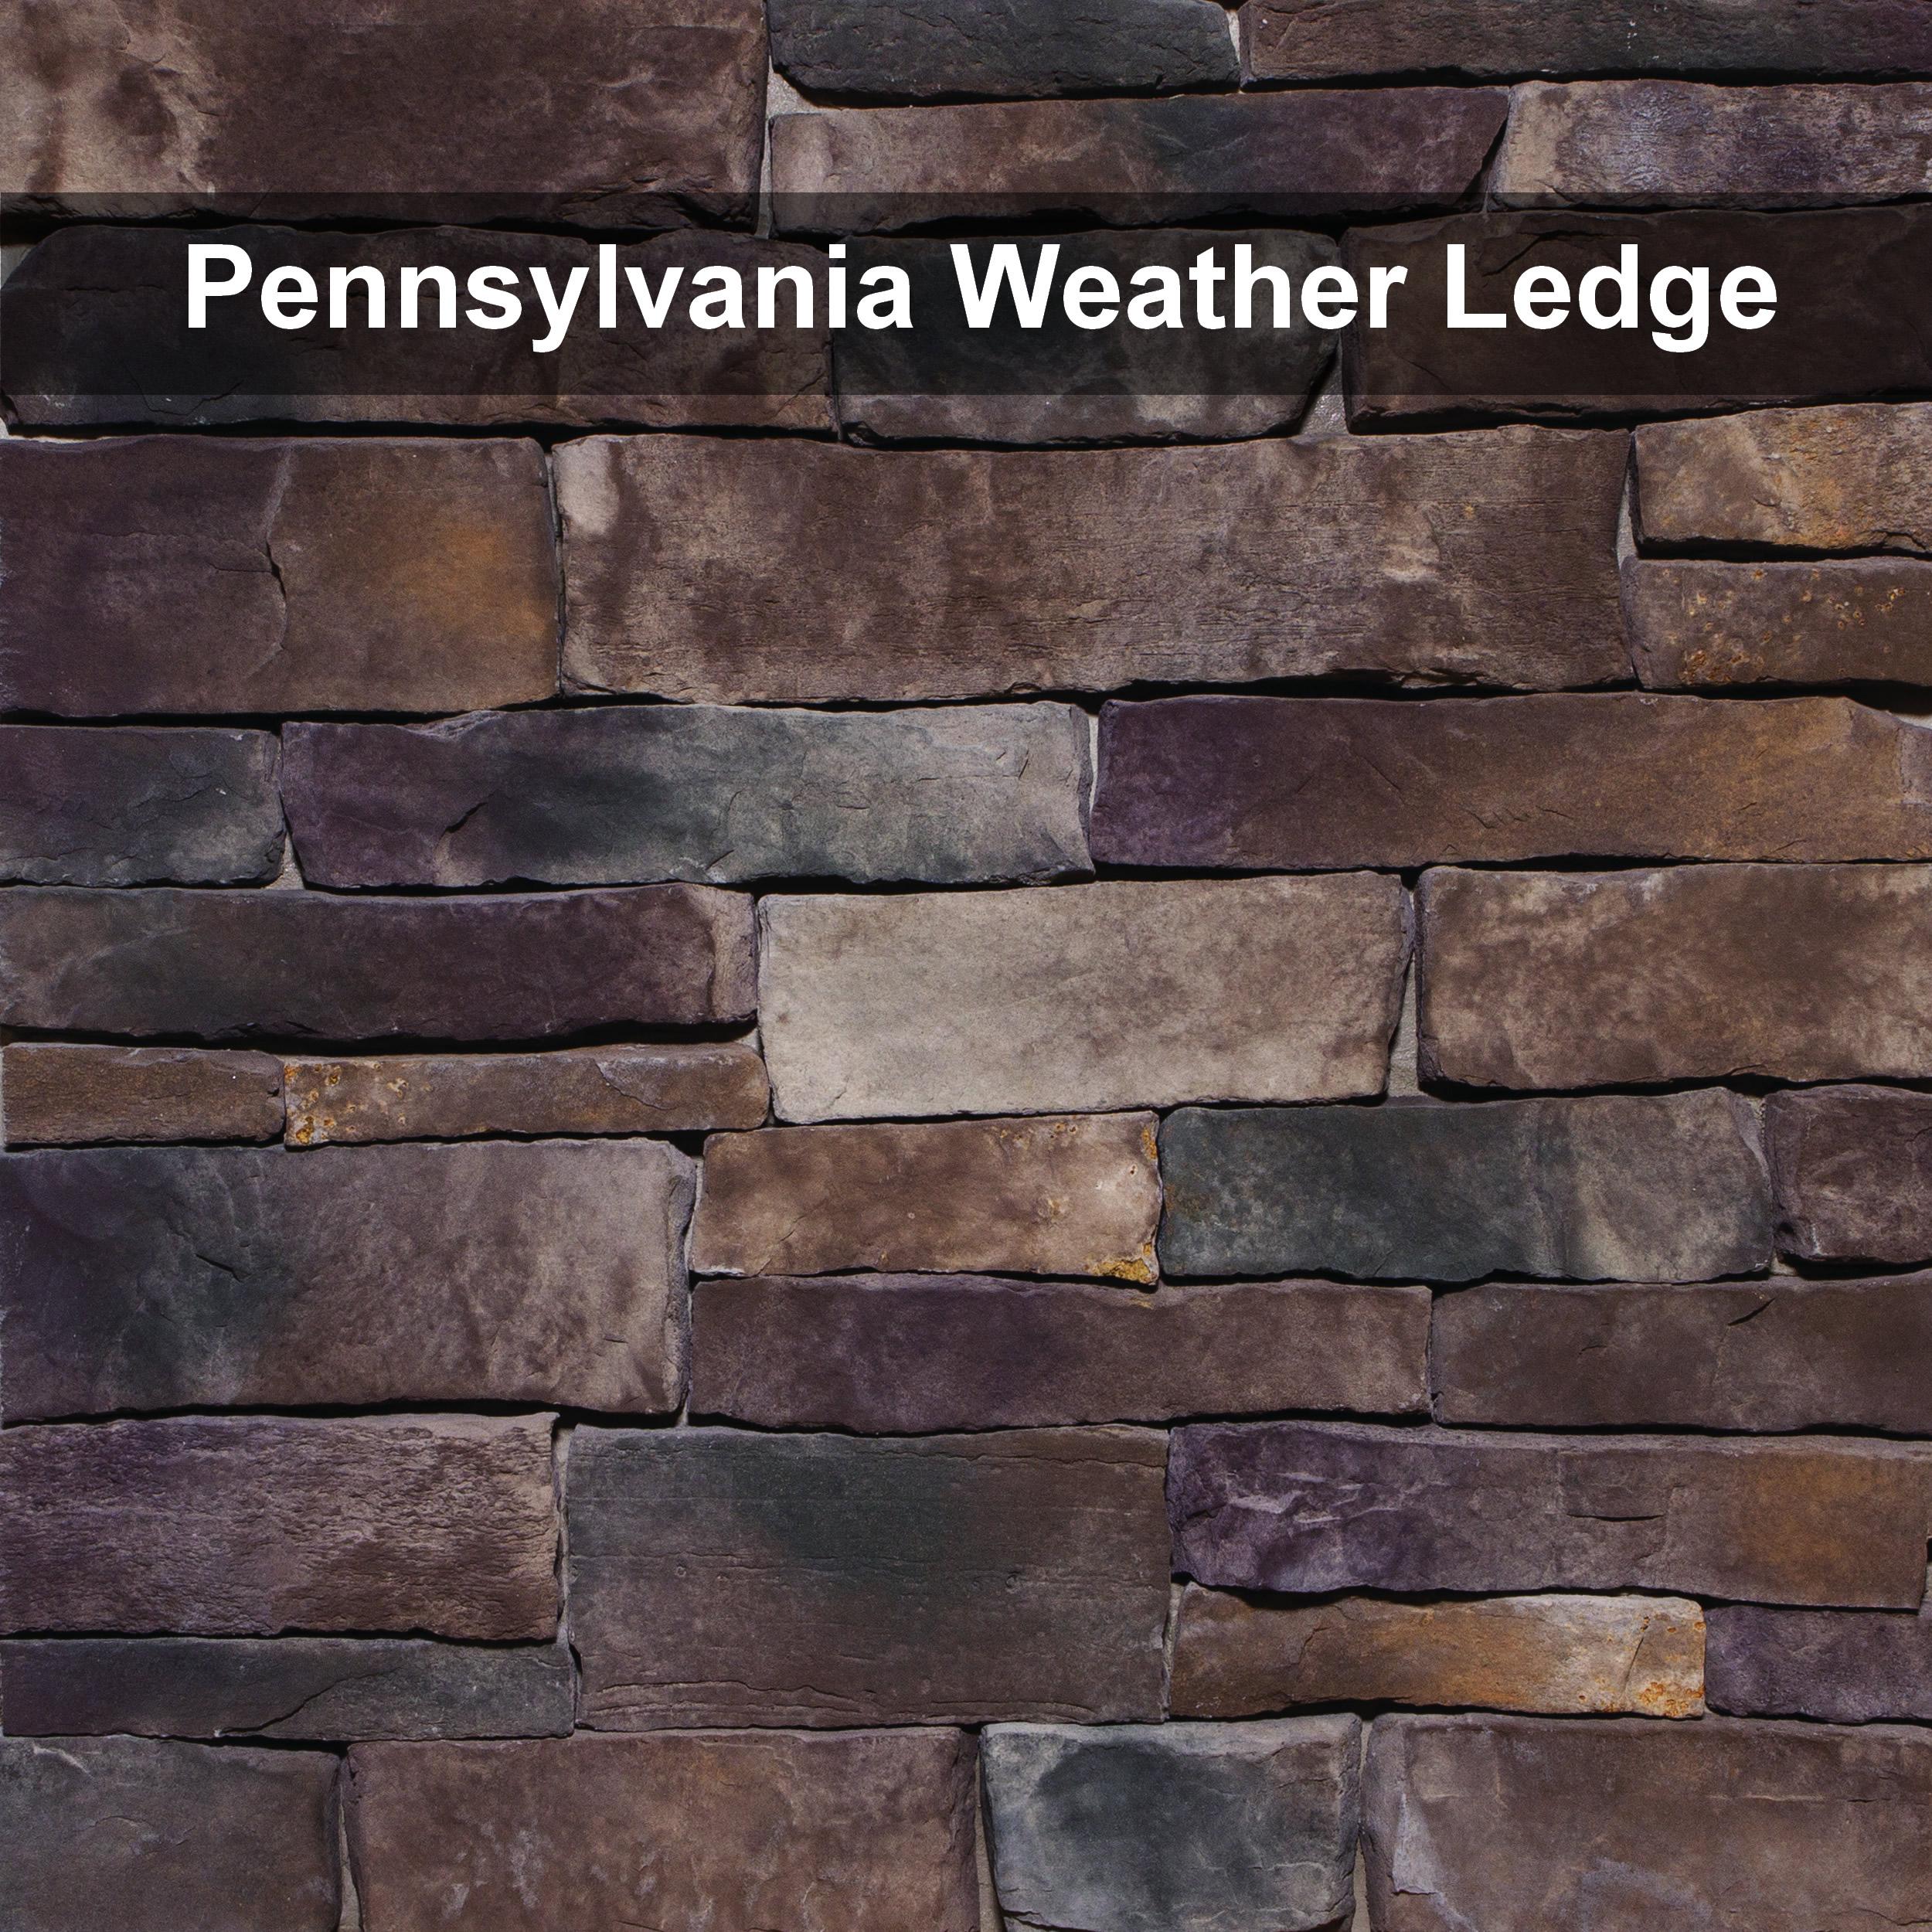 DQ_Weather Ledge_Pennsylvania_Profile.jpg